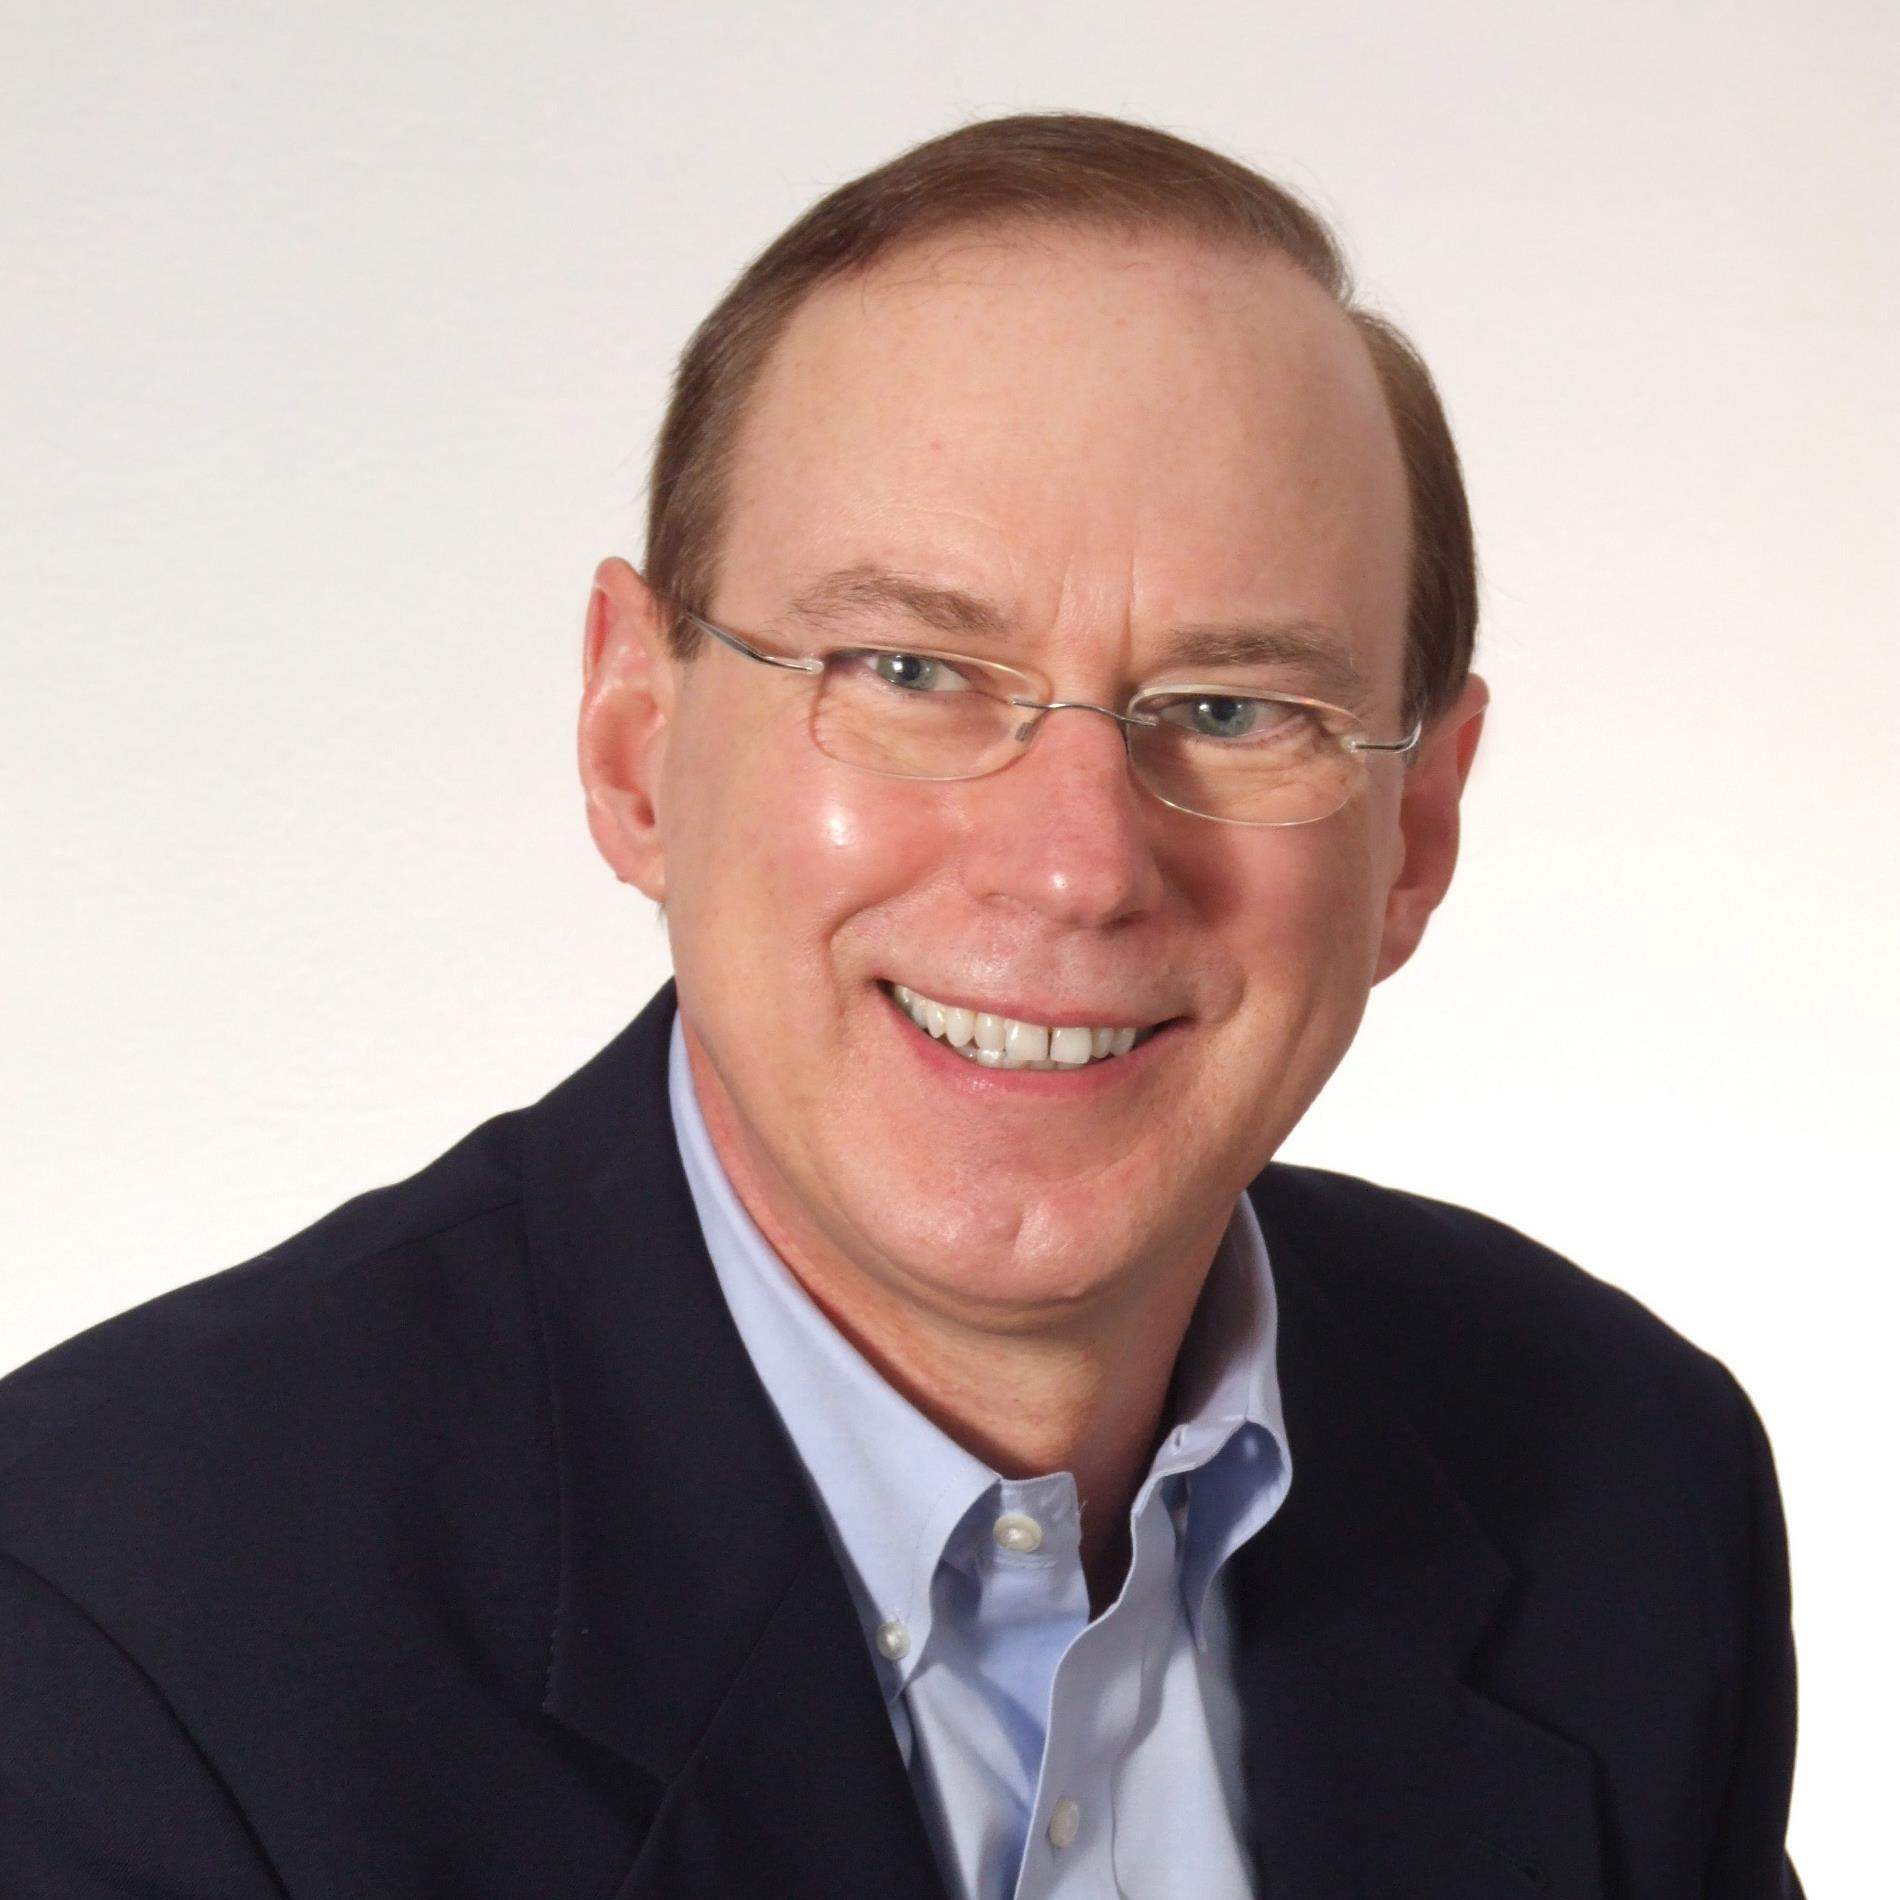 David Hubbard